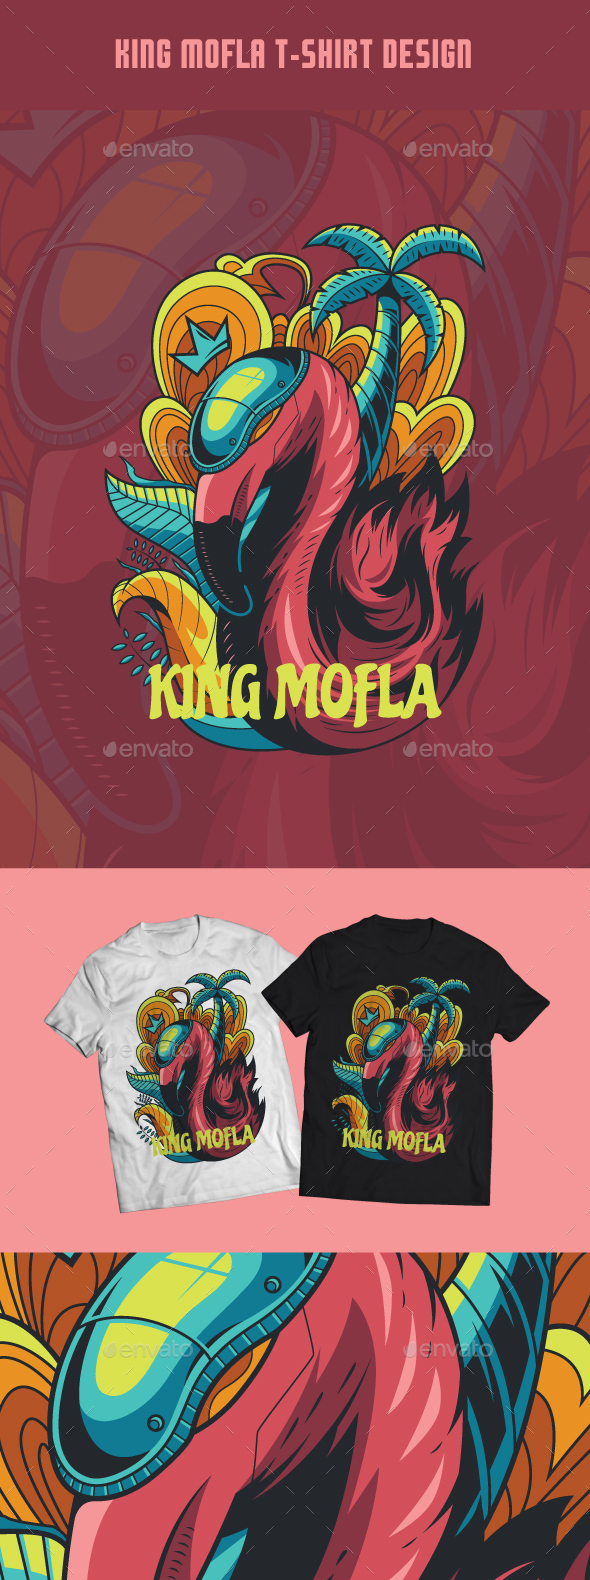 King Mofla T-Shirt Design